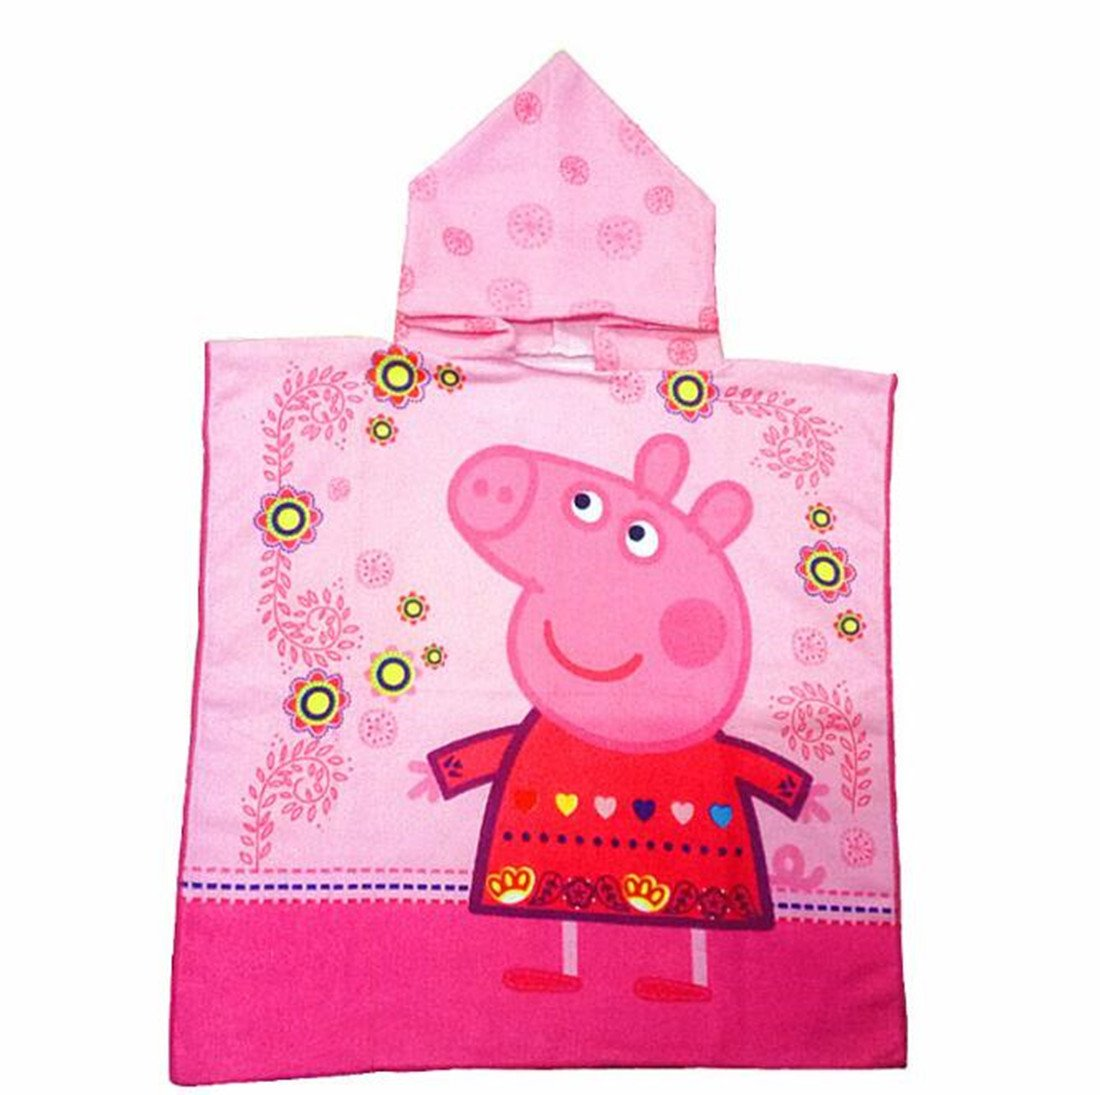 SWEETXIN Infant Kids Animal Design Hooded Bath/Beach Poncho Towel (Pepe pig)